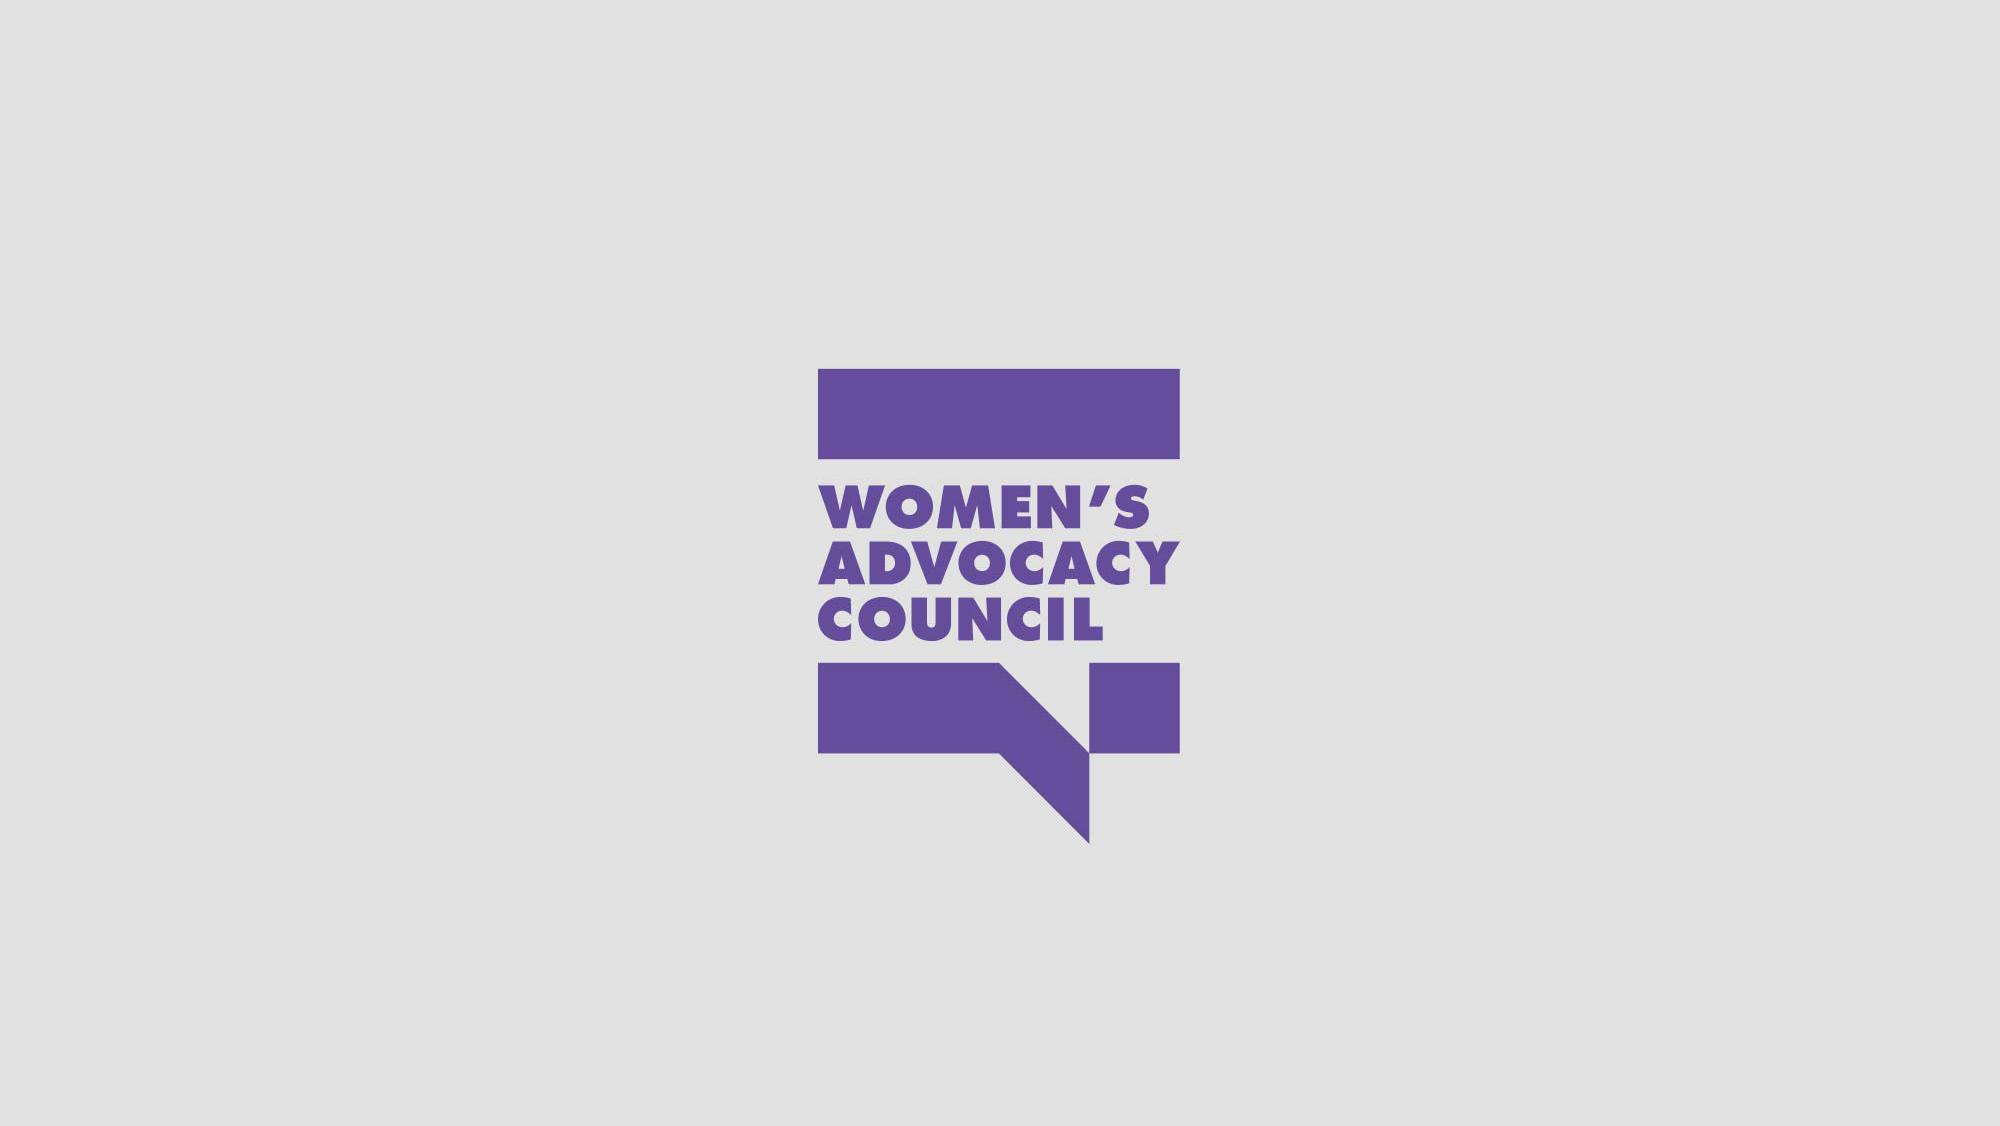 Women's Advocacy Council Logo & Identity Design